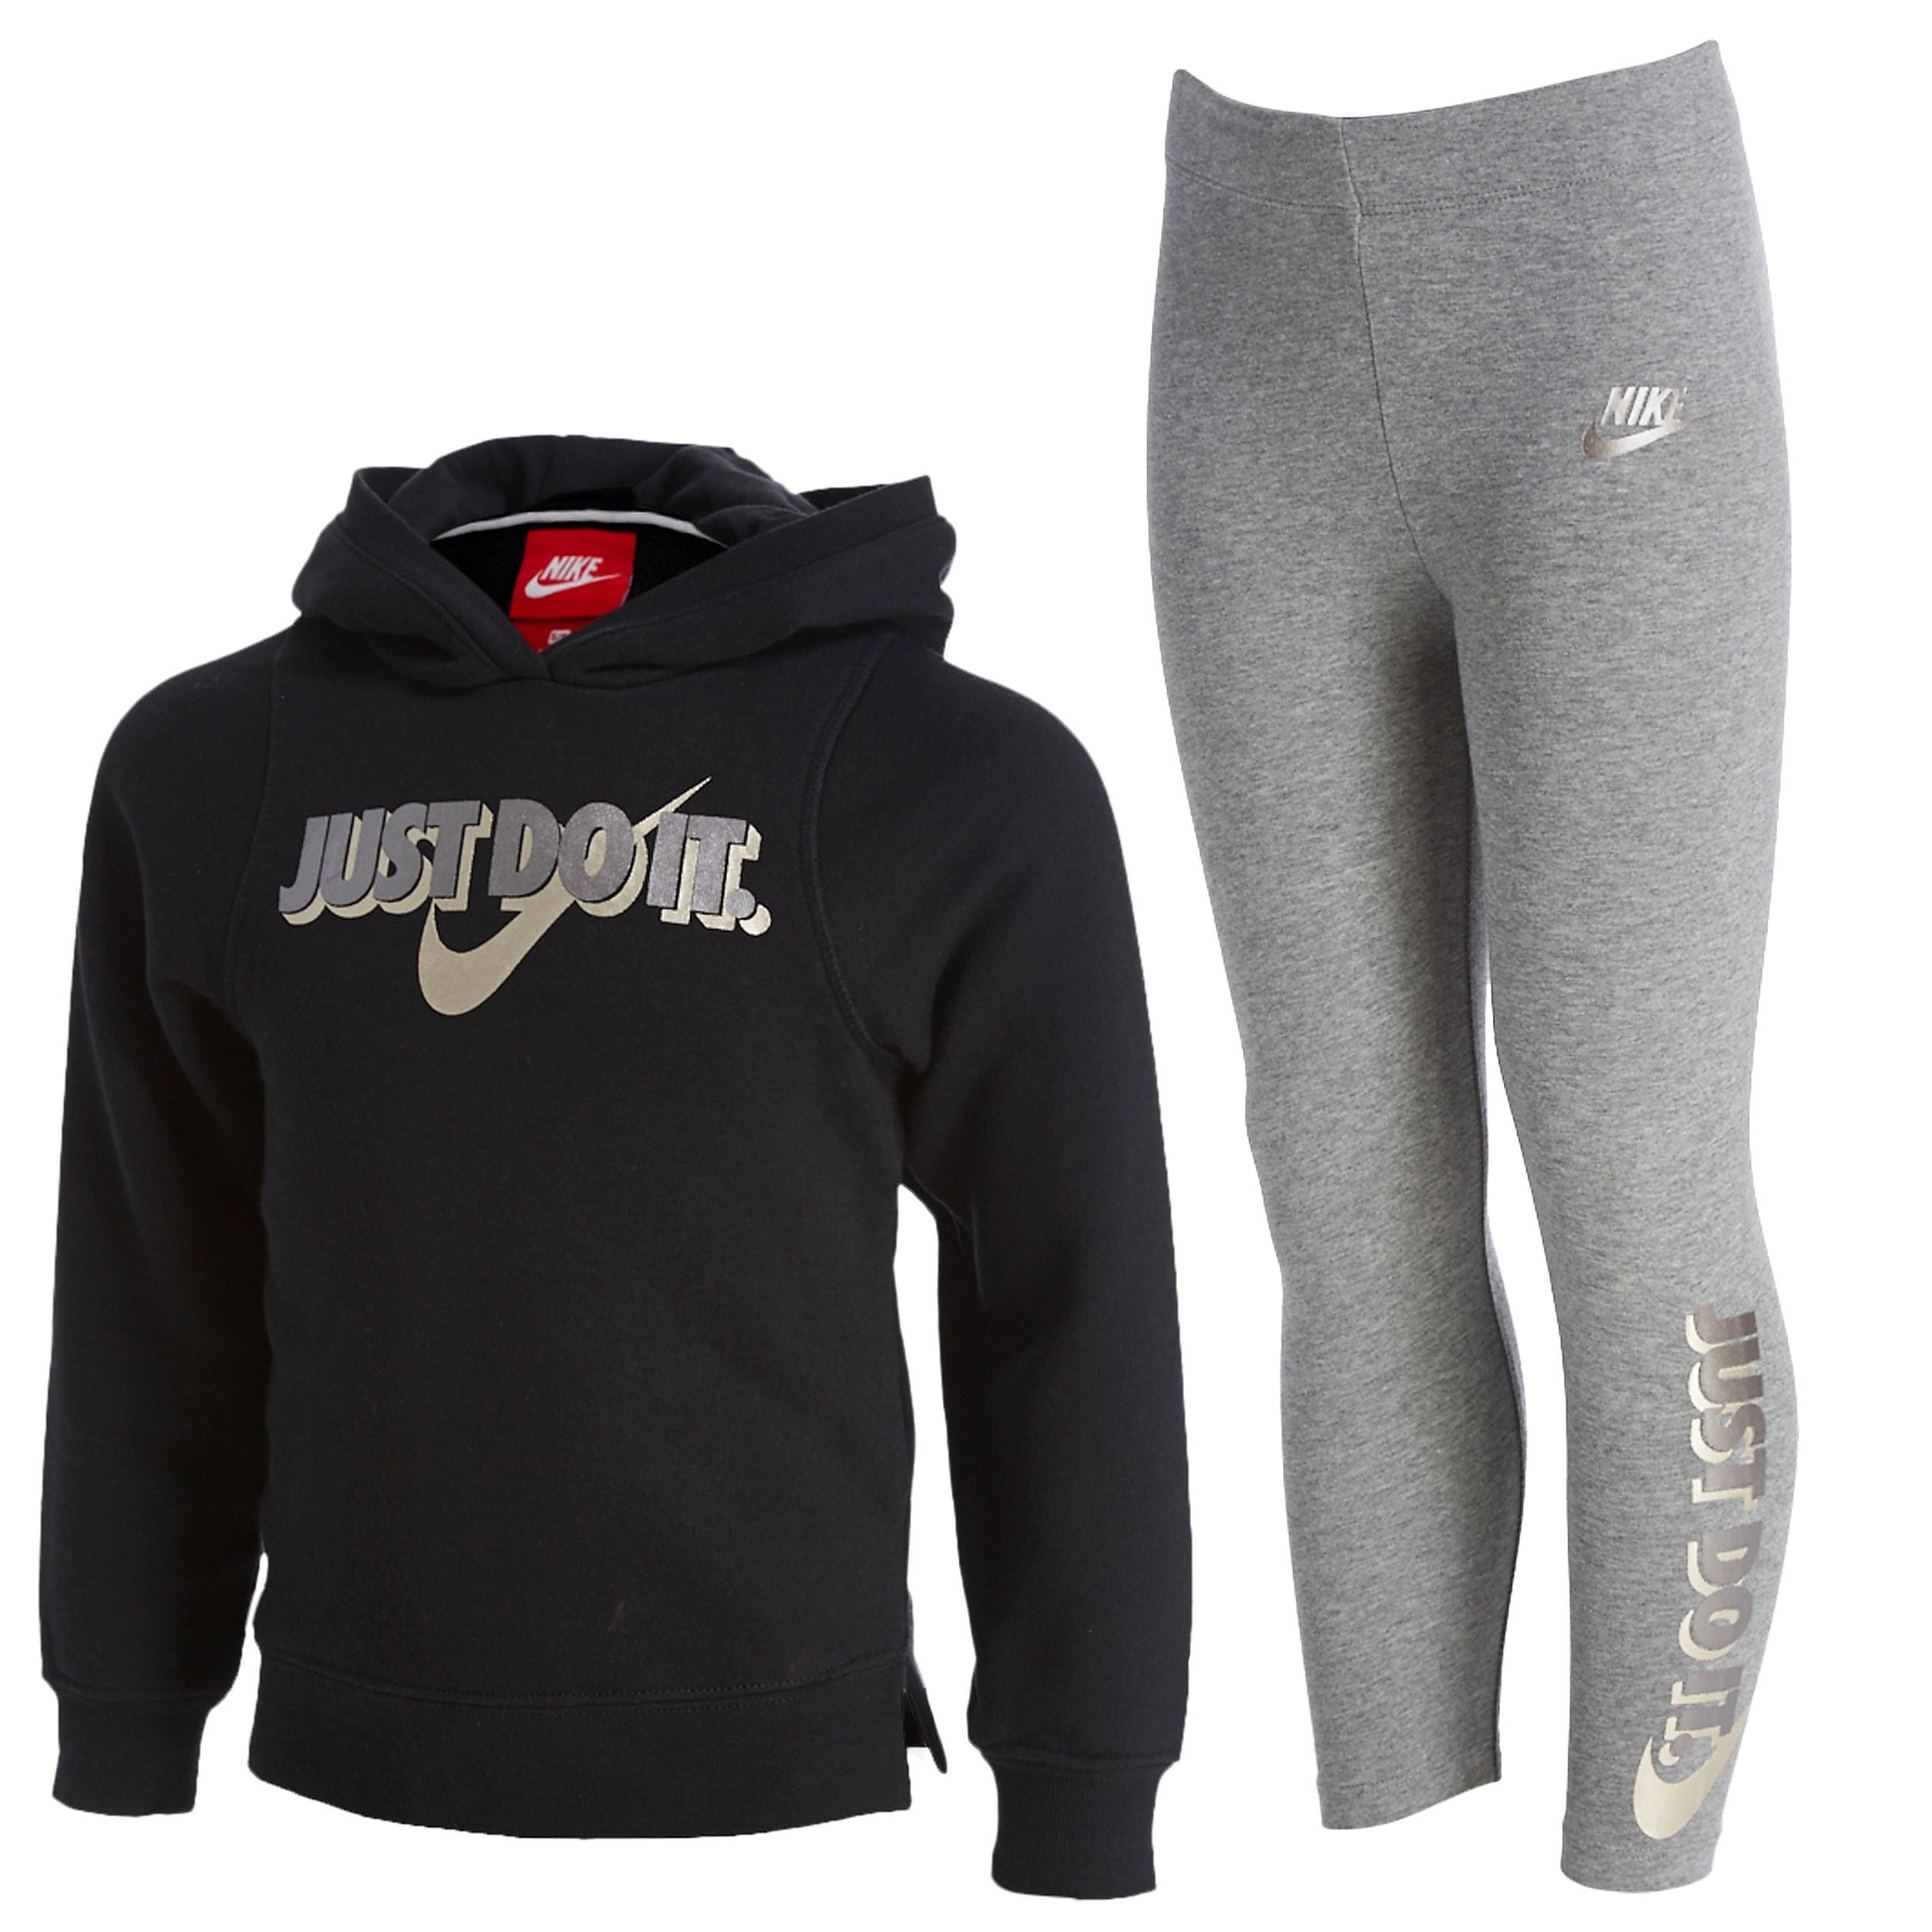 Nike Girls' Just Do It Hoodie/Leggings Set Children